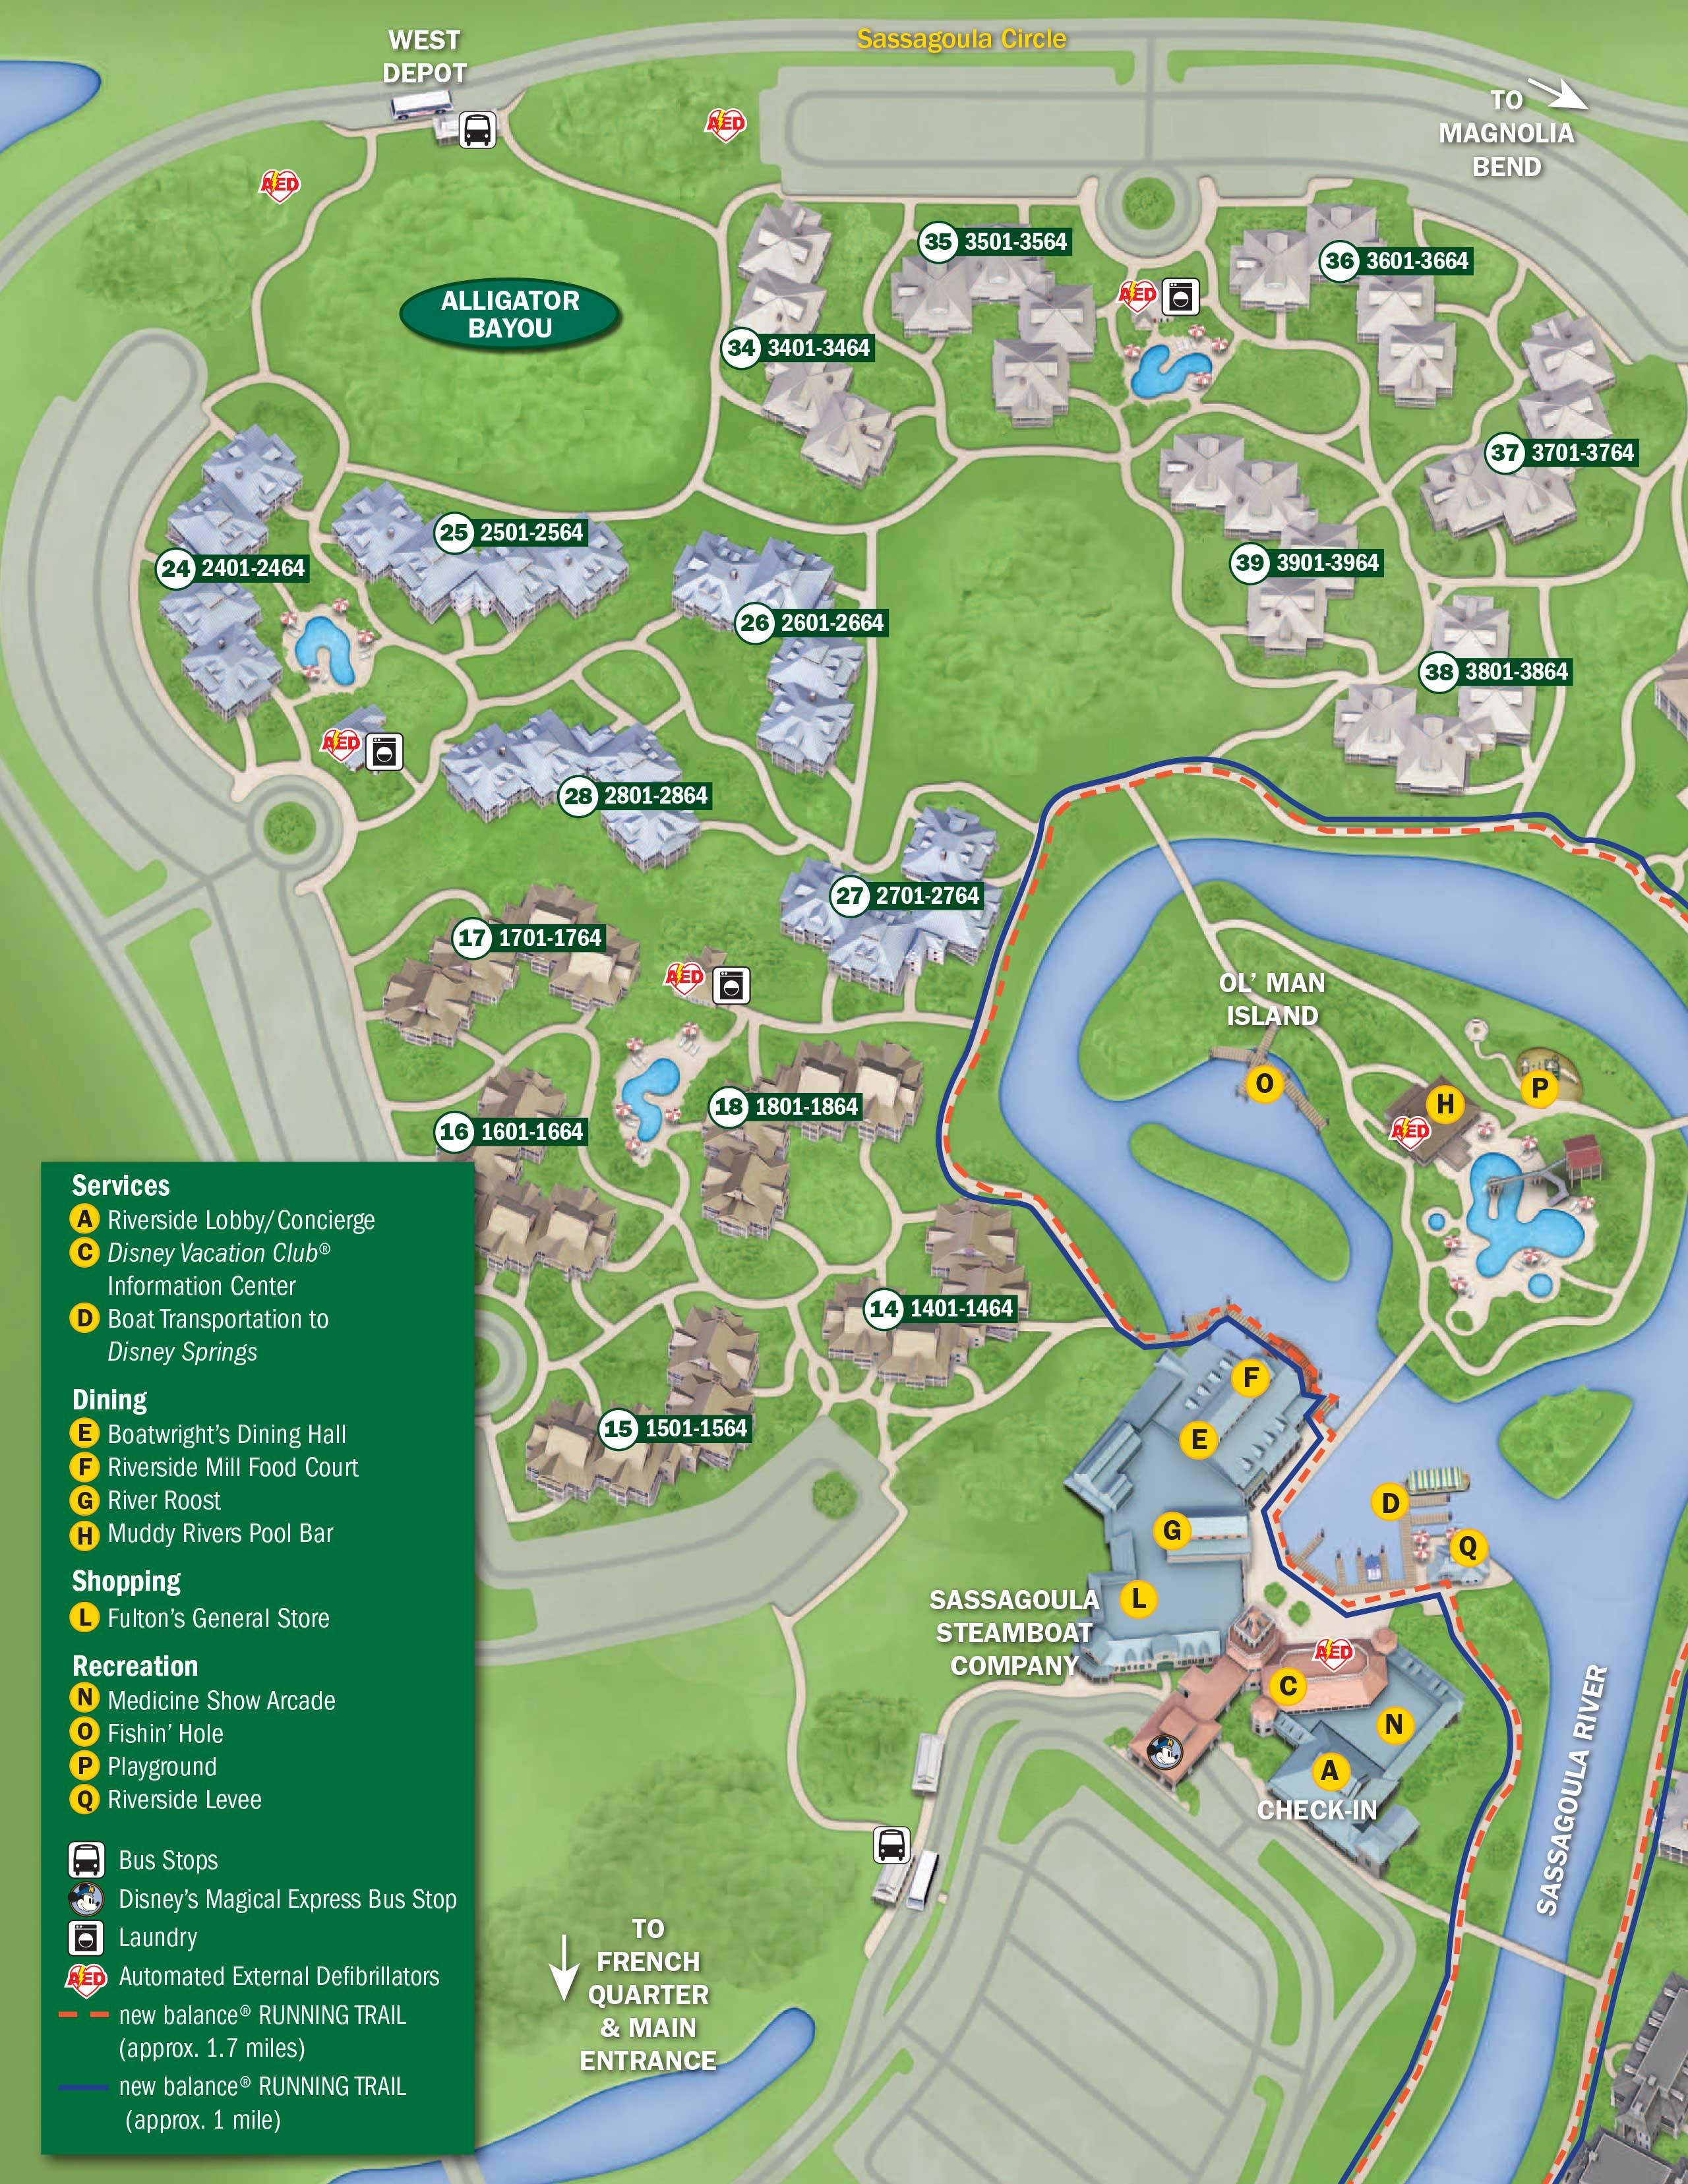 April 2017 Walt Disney World Resort Hotel Maps - Photo 8 of 33